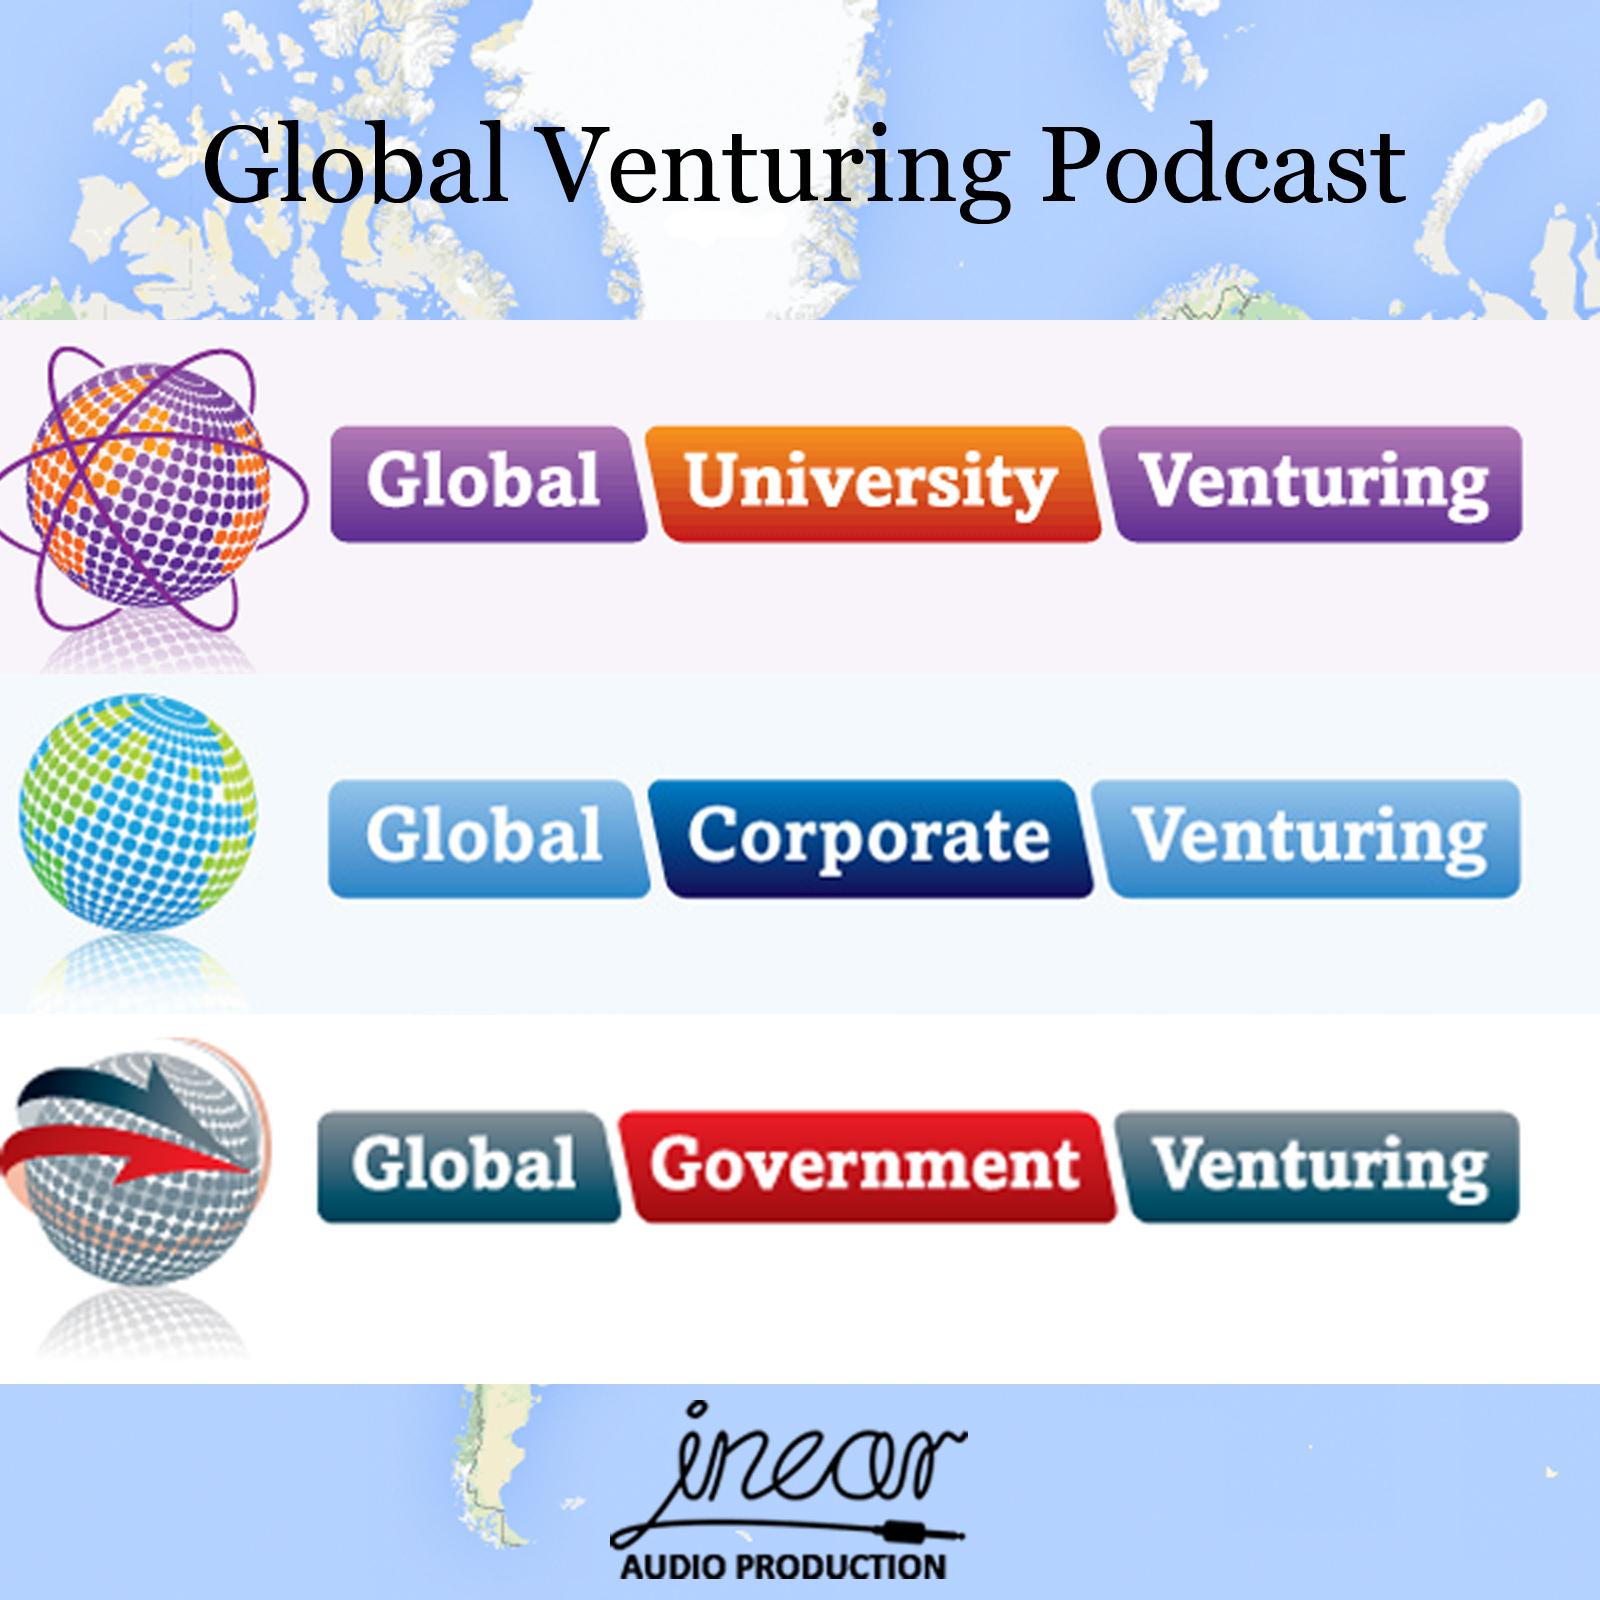 Global Venturing Podcast